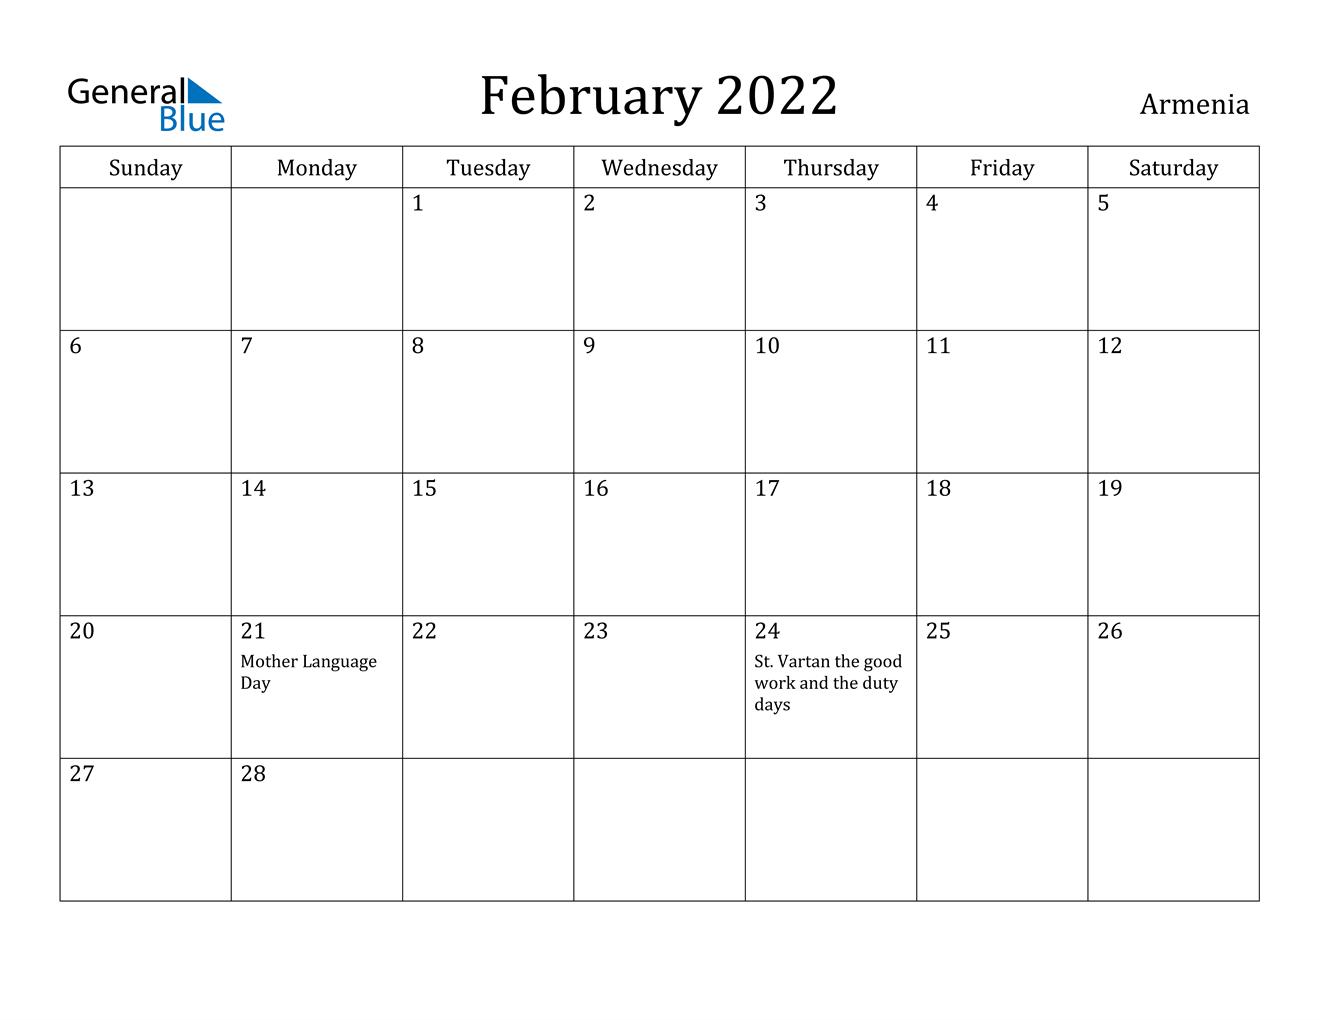 Armenia February 2022 Calendar With Holidays